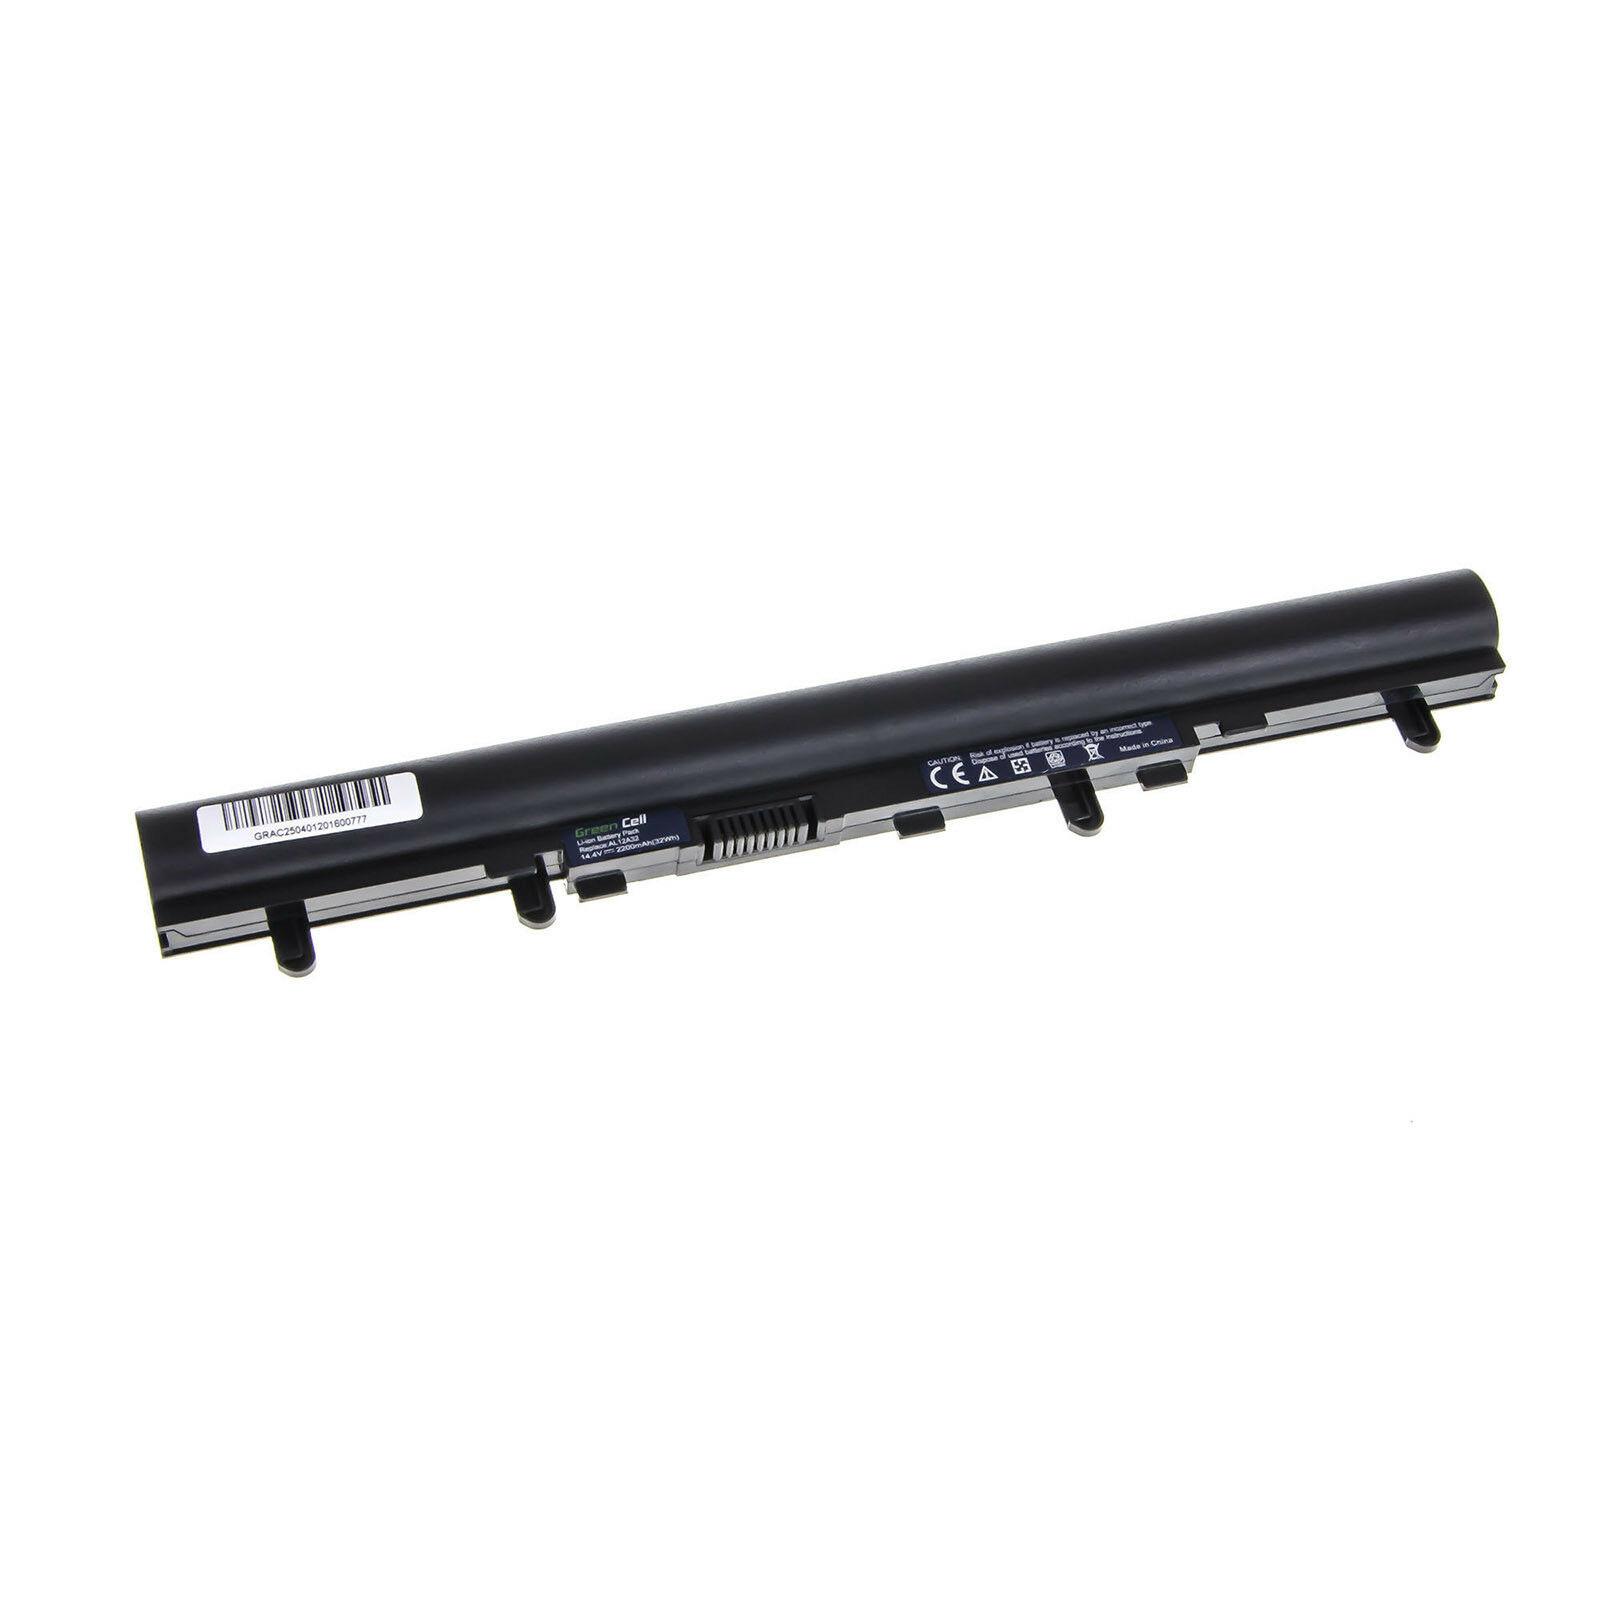 Akku für Acer Aspire V5-171 V5-431 V5-531 V5-571 V5-571-6679 AL12A32(Ersatz)